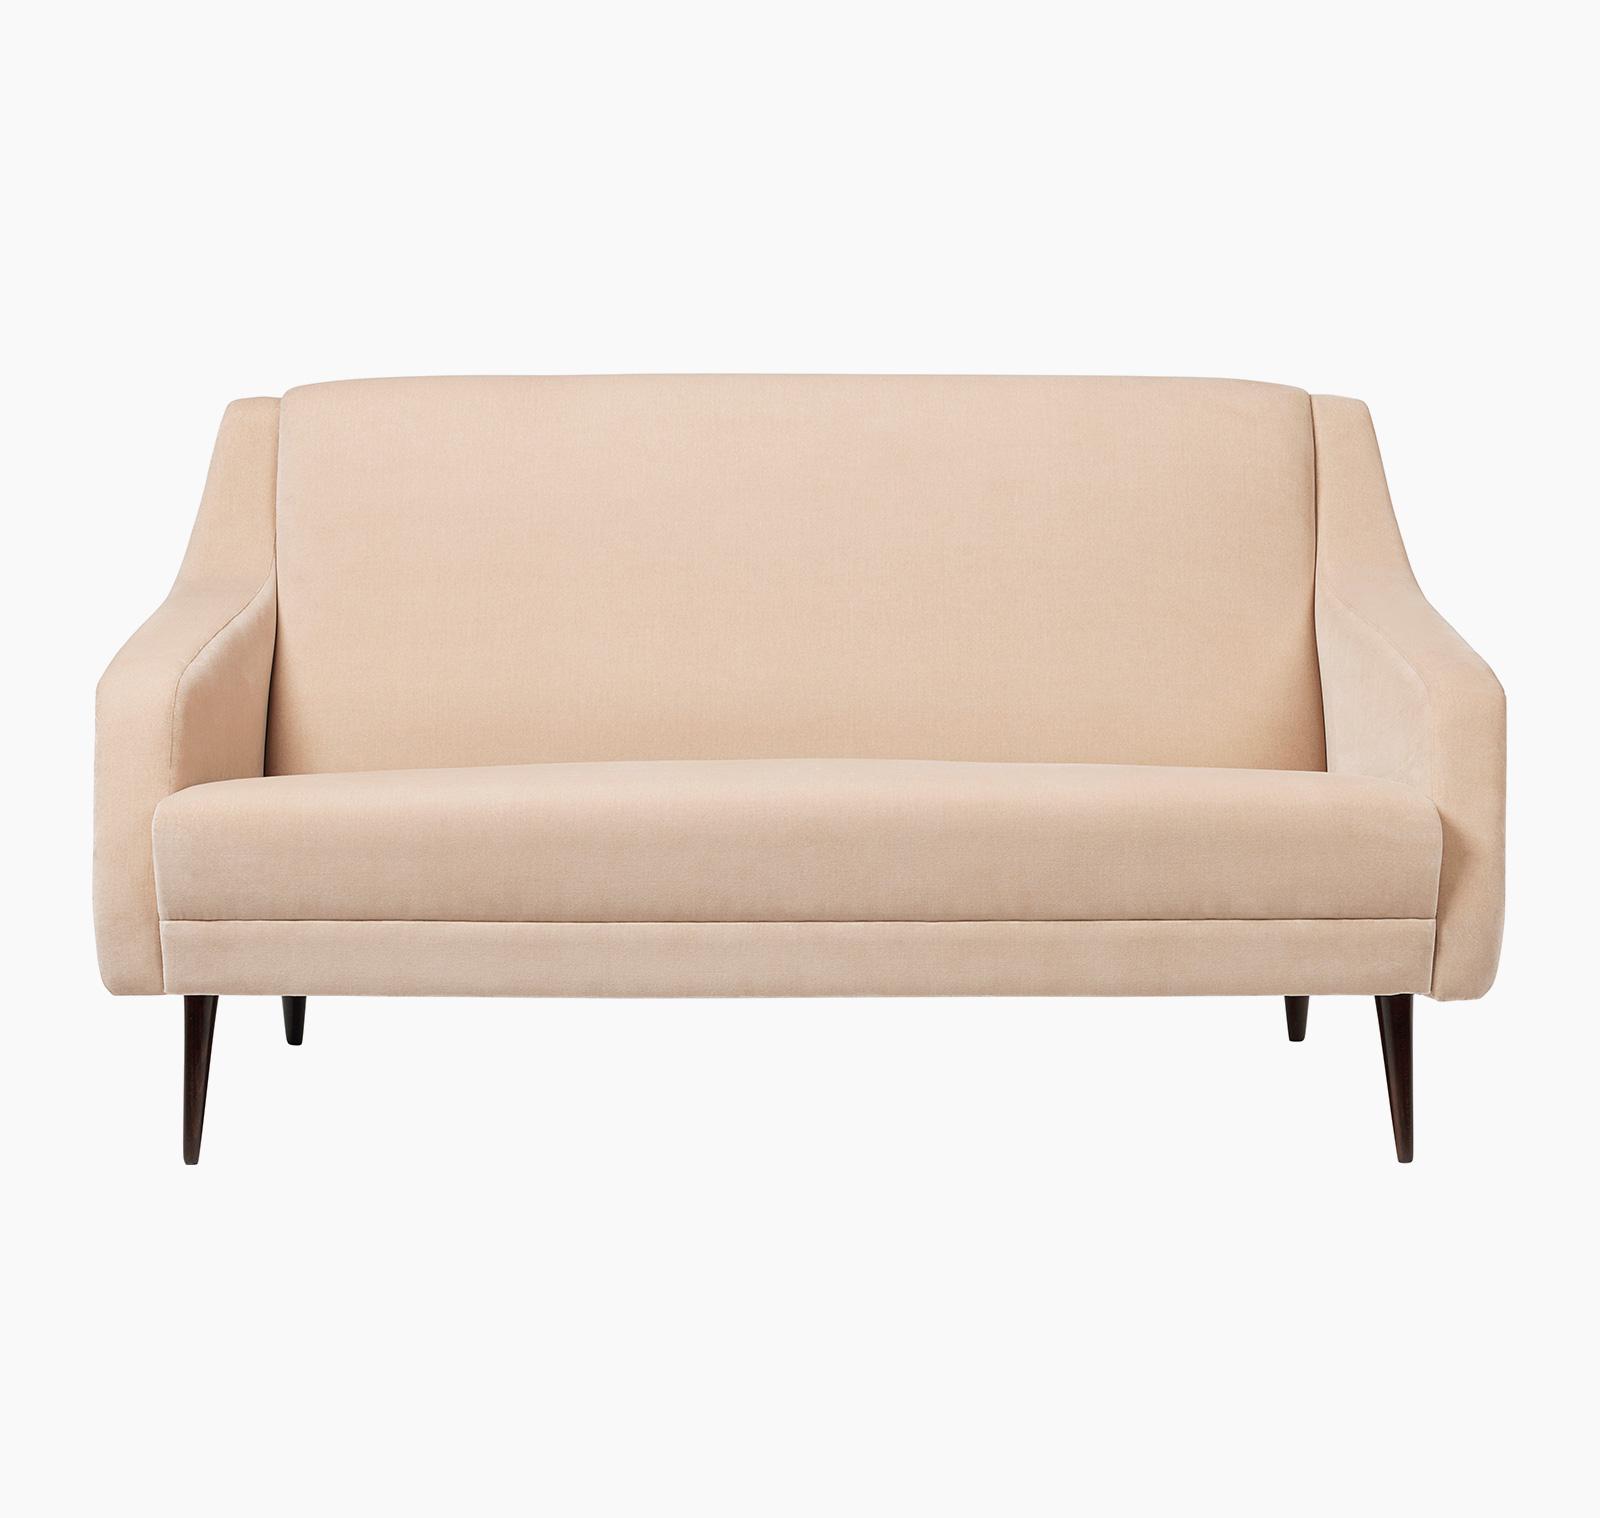 TinnappleMetz-Gubi-CDC2-sofa-02